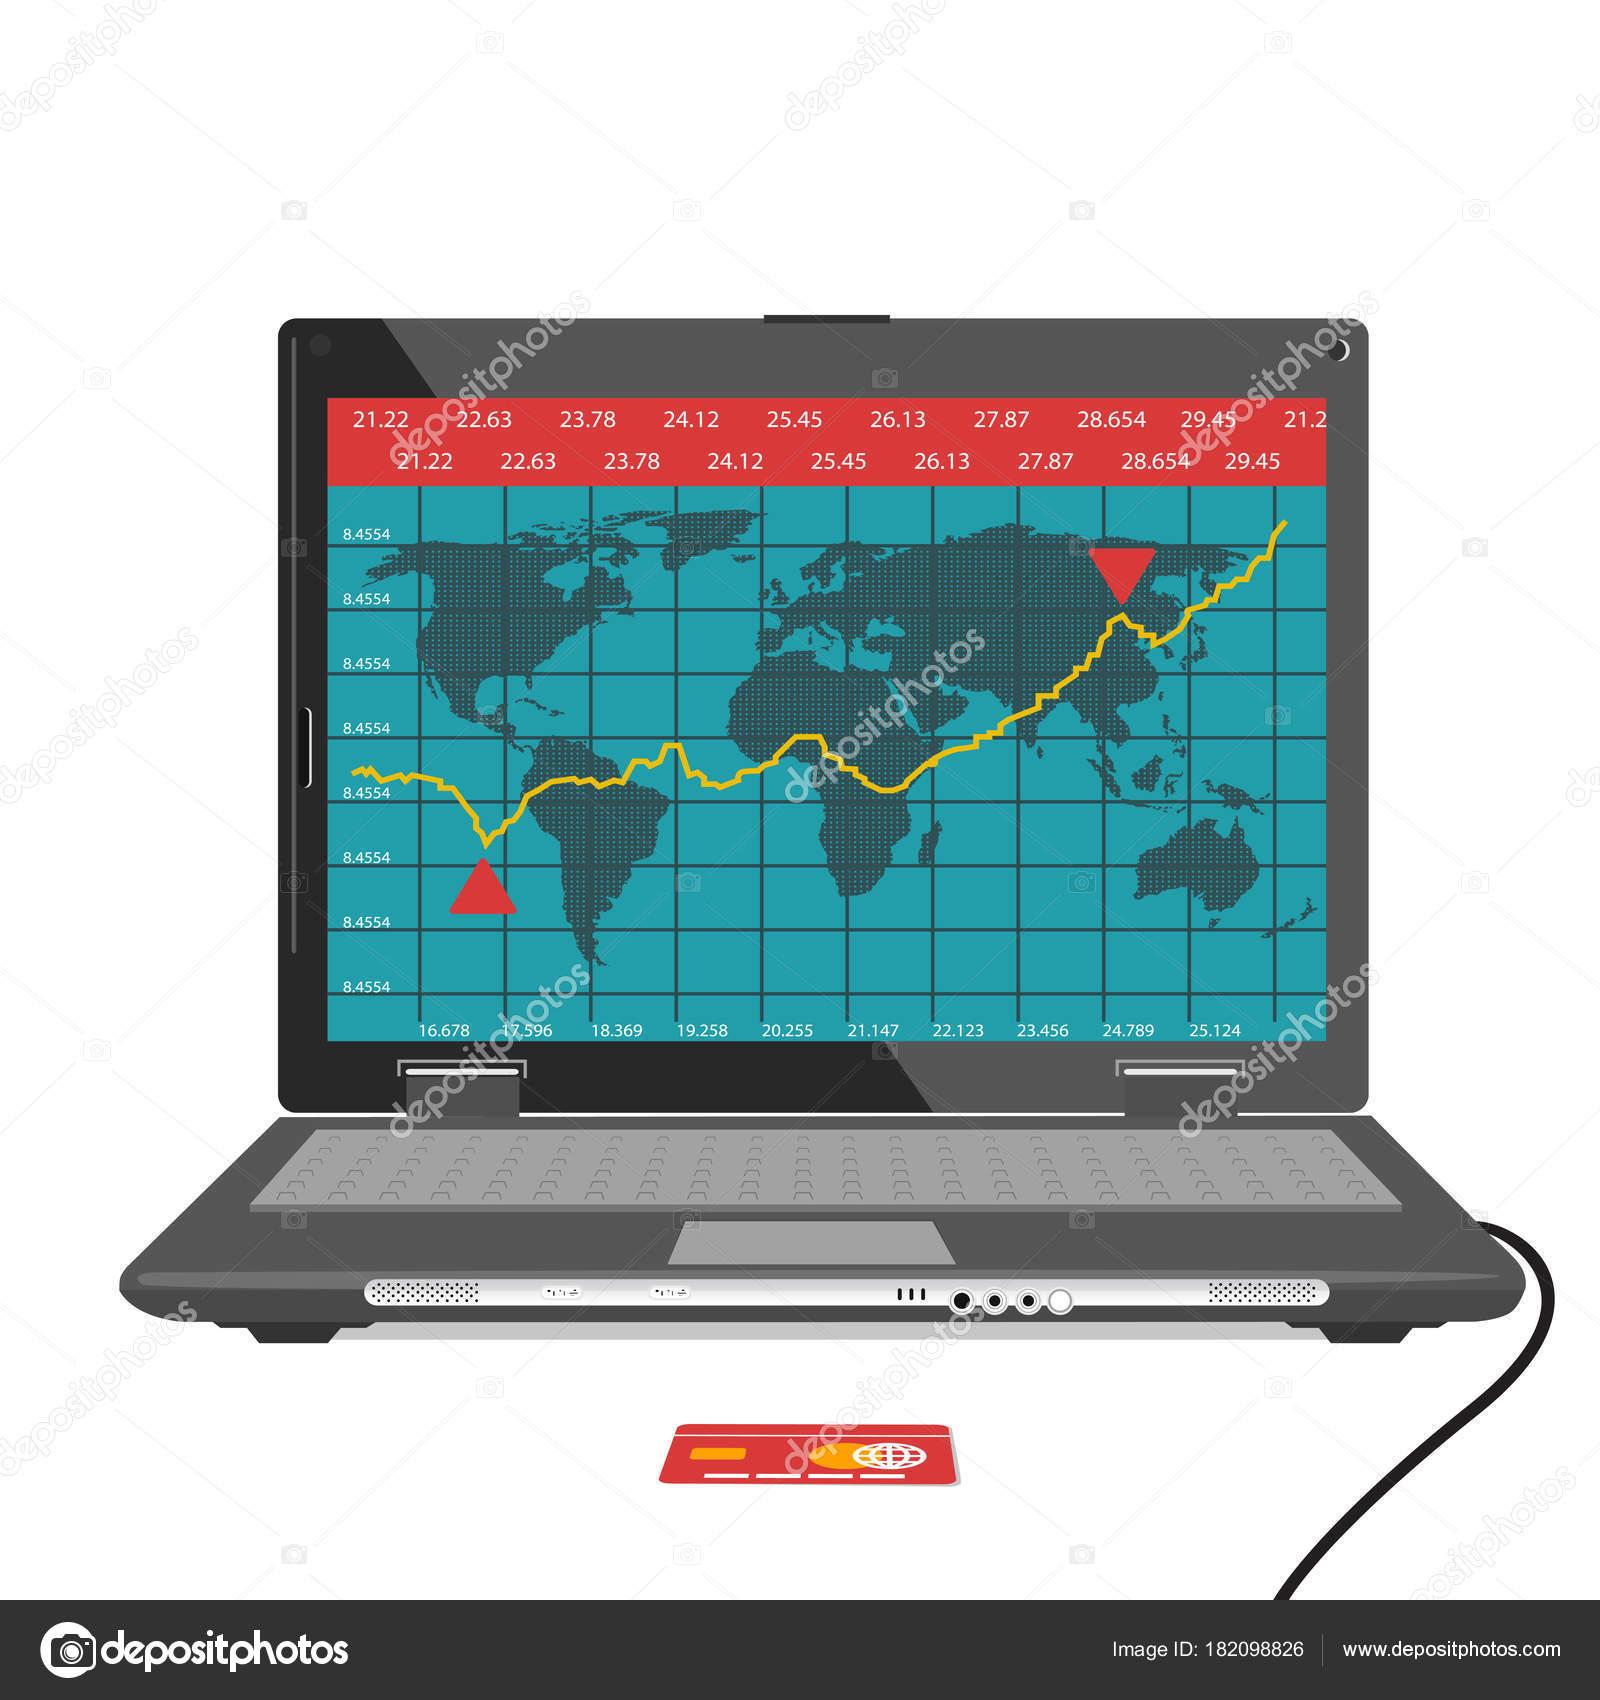 Ноутбук для торговли на форекс скриншот счета форекс